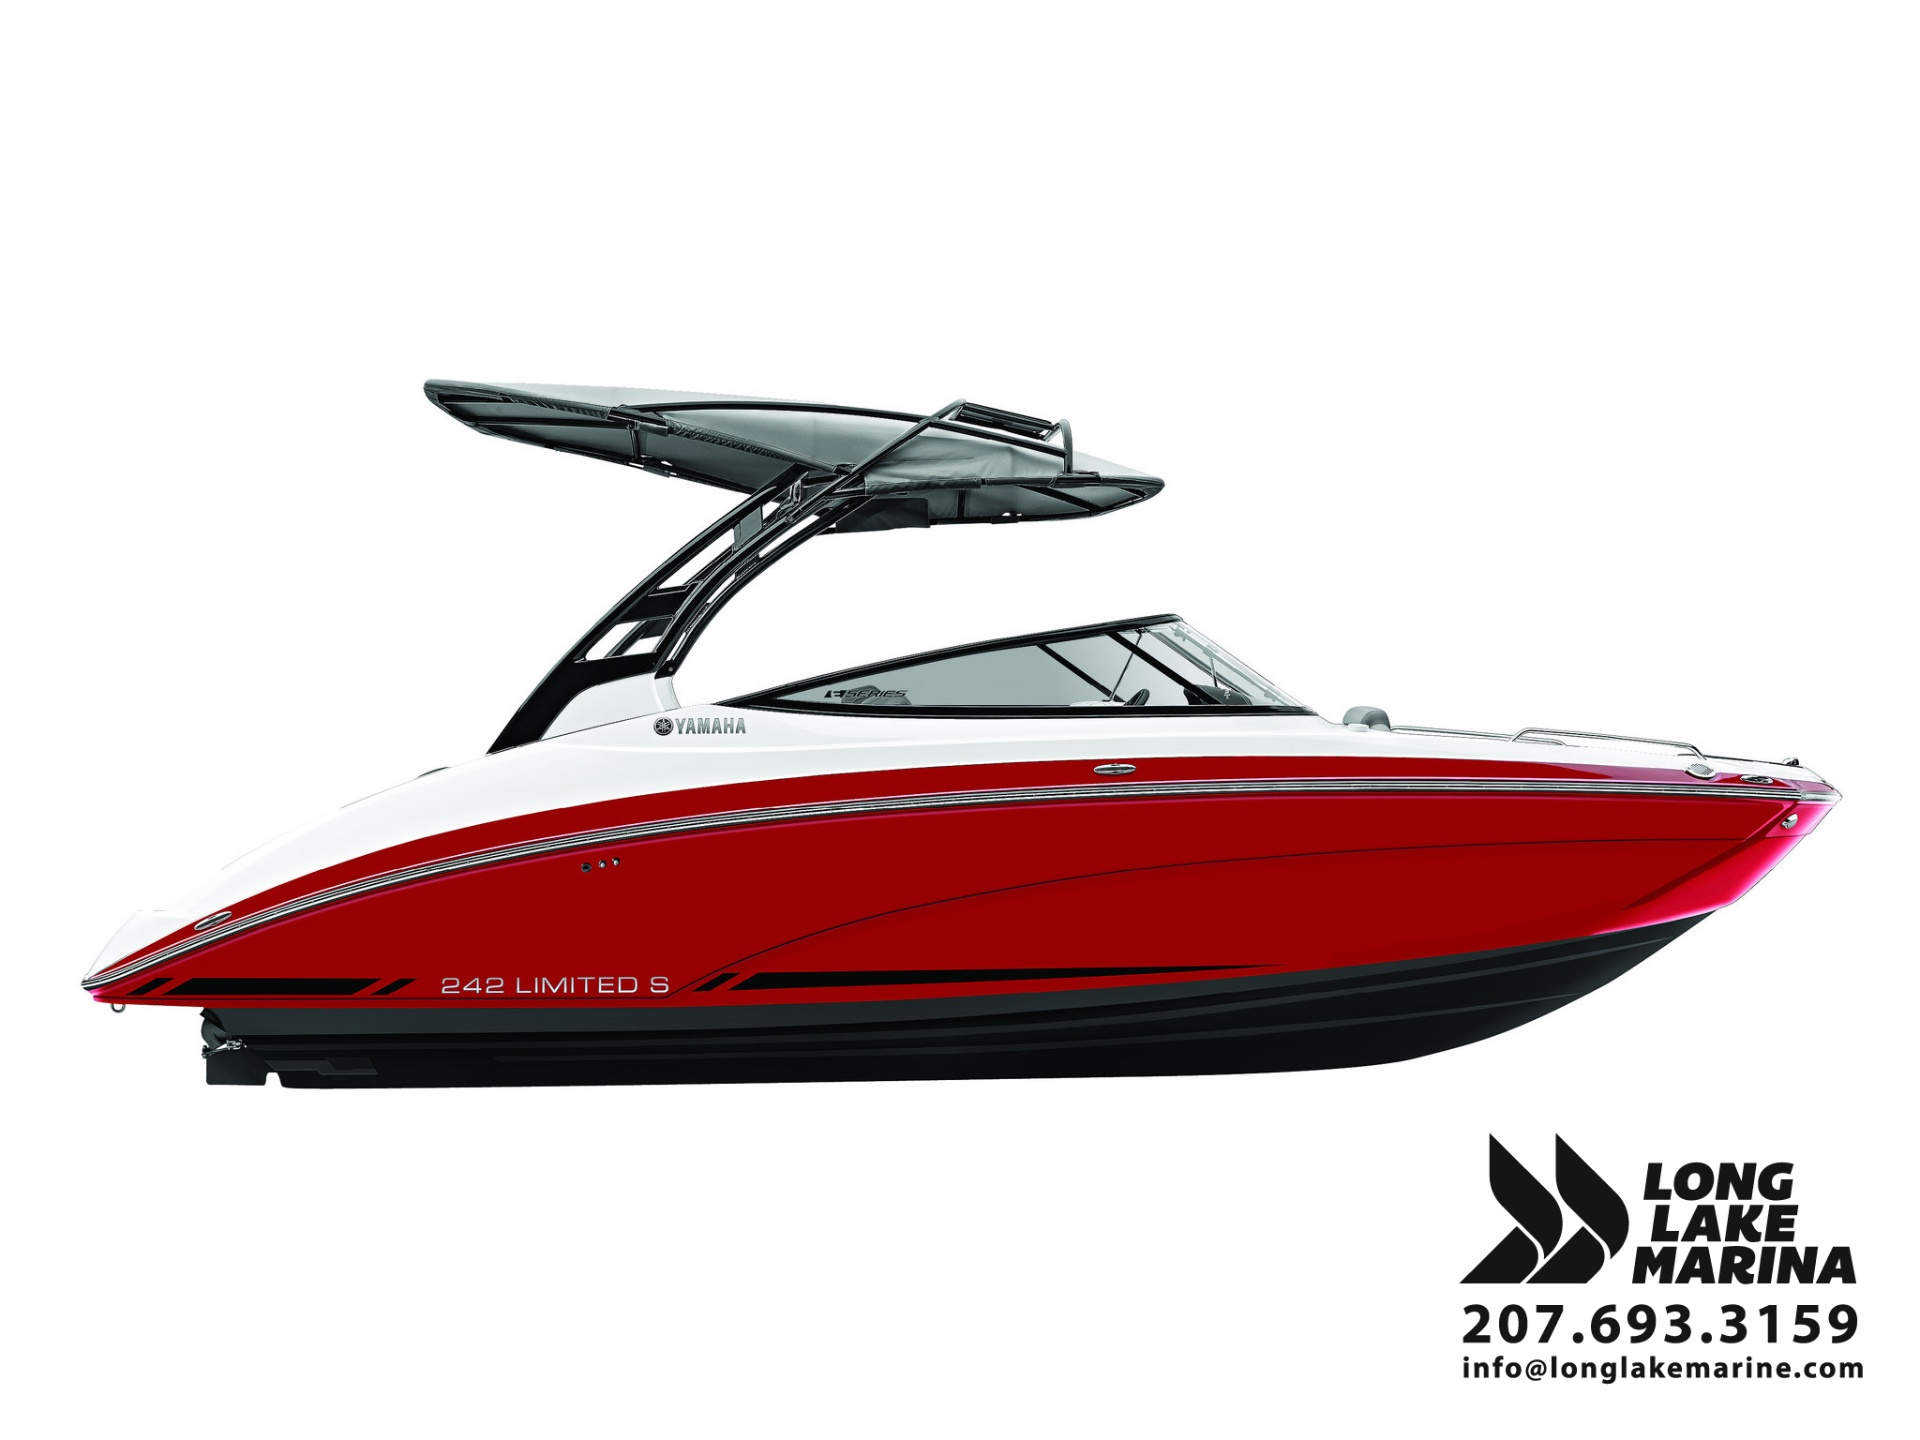 2016 Yamaha 242 Limited S E-Series